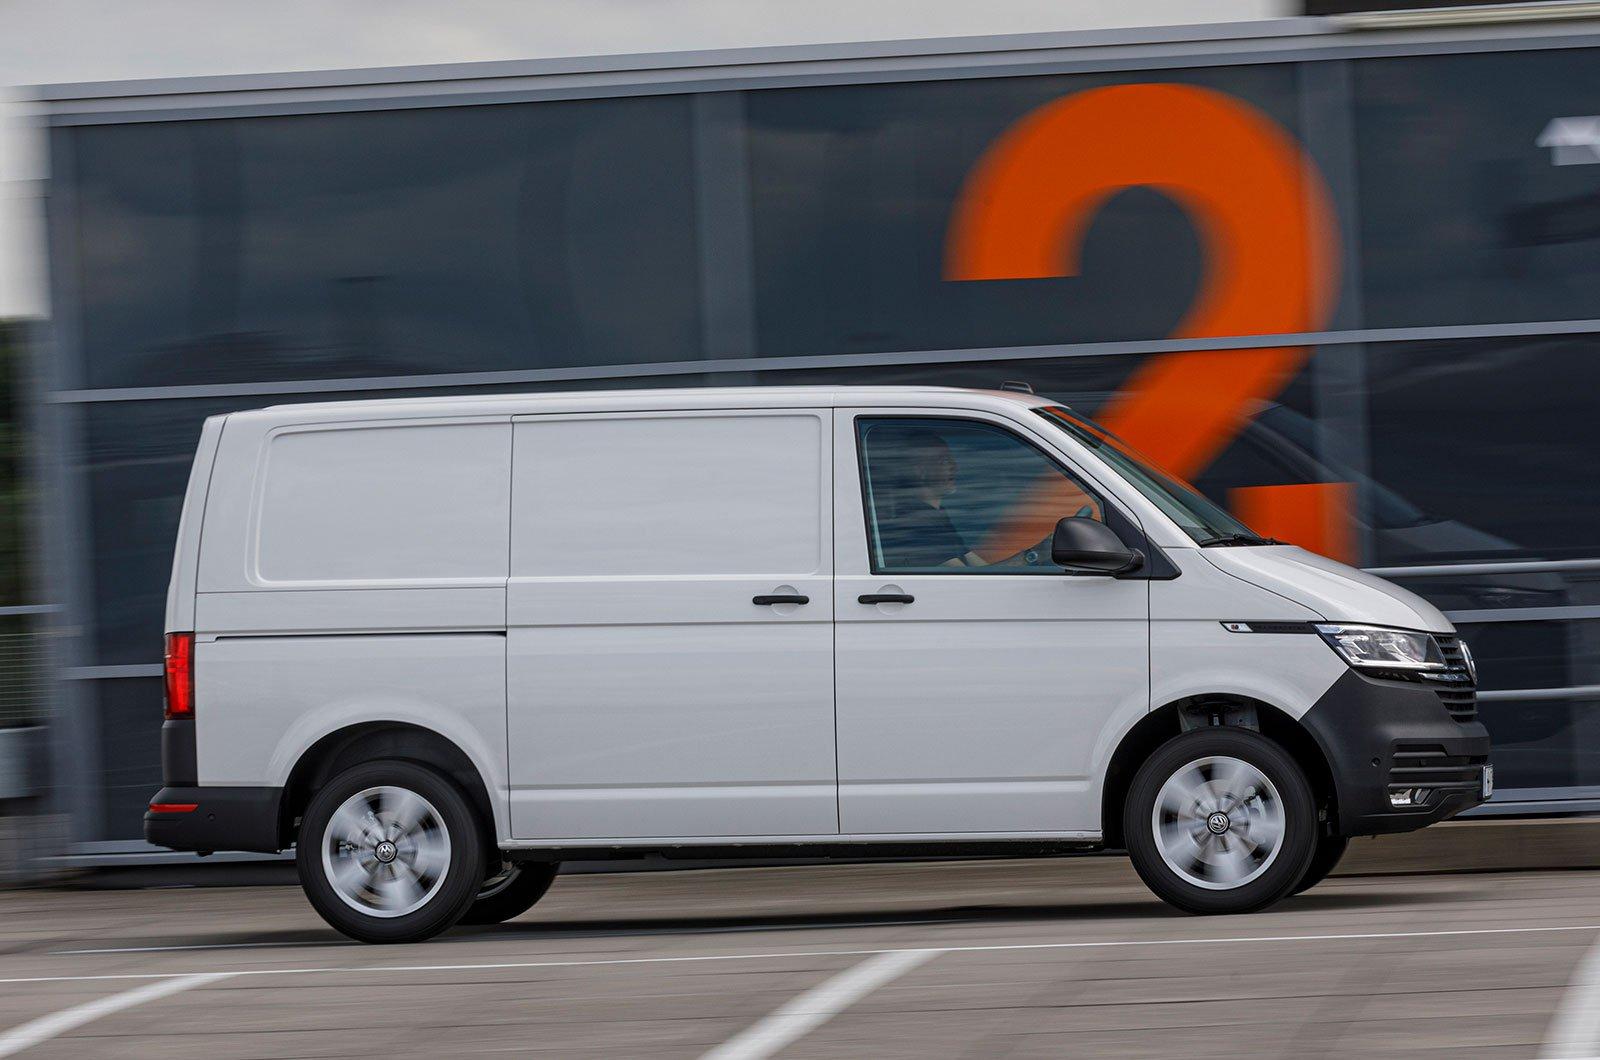 Volkswagen Transporter side